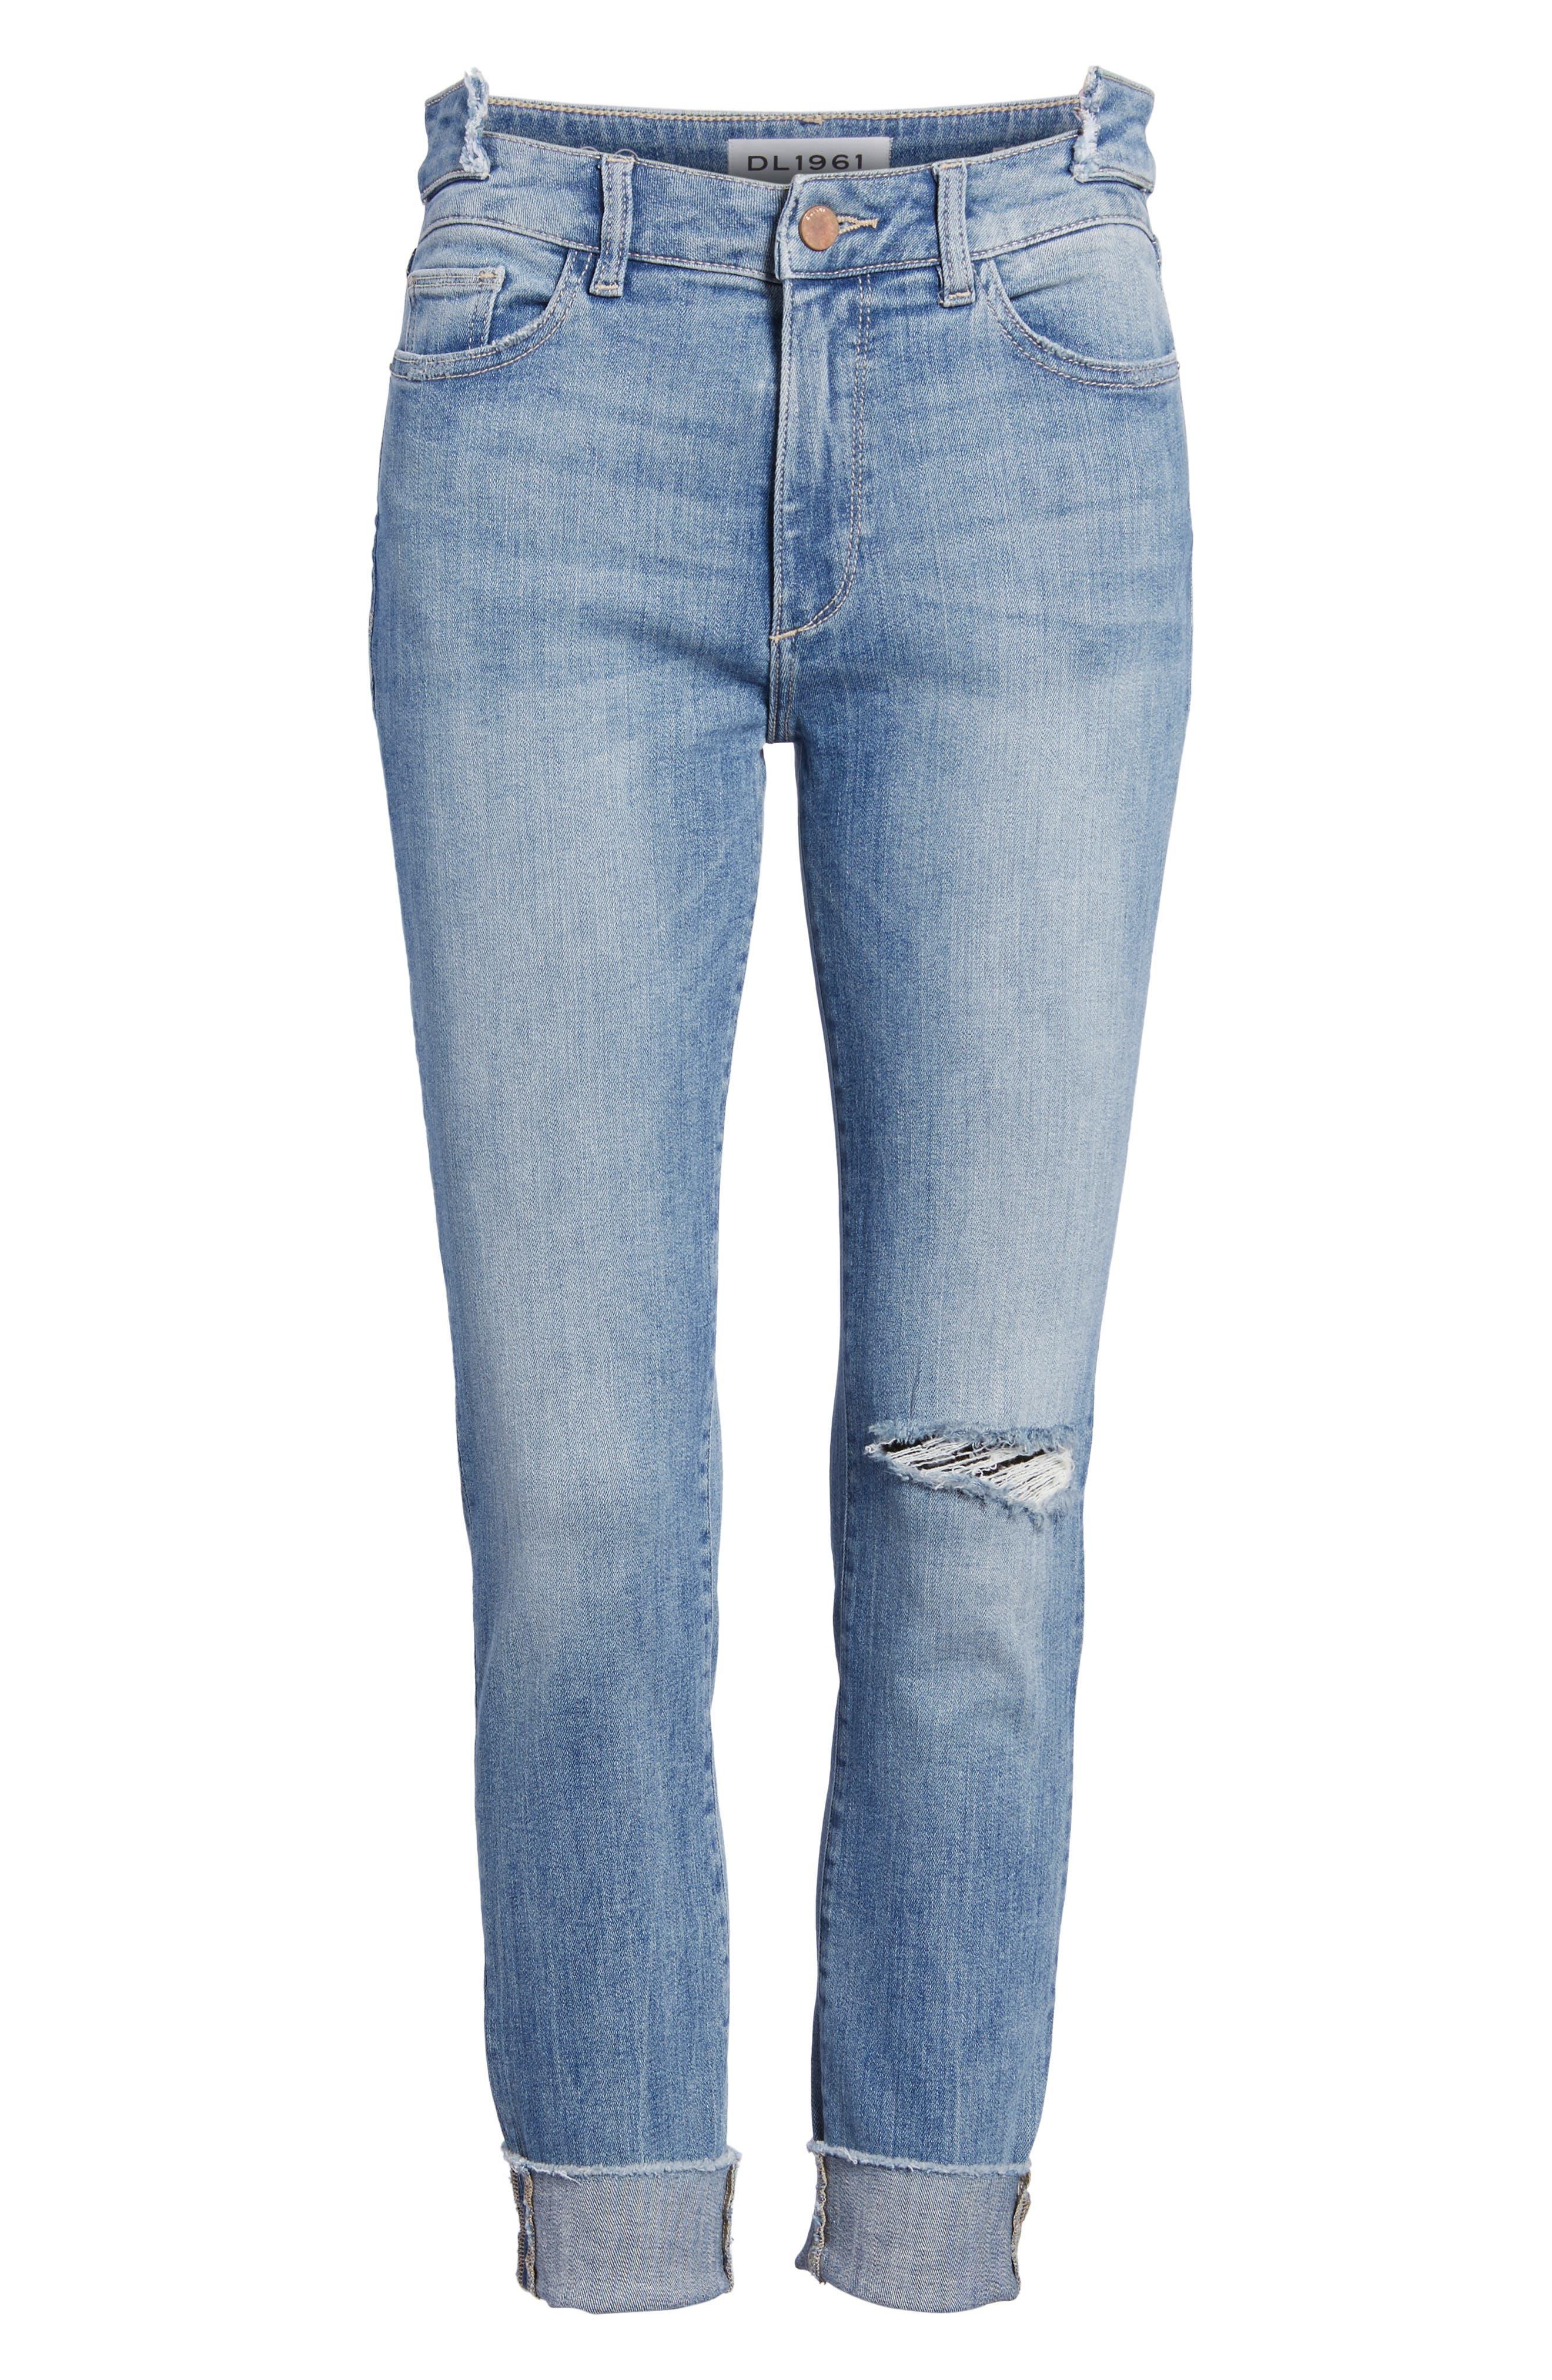 Farrow Instaslim High Waist Ankle Skinny Jeans,                             Alternate thumbnail 7, color,